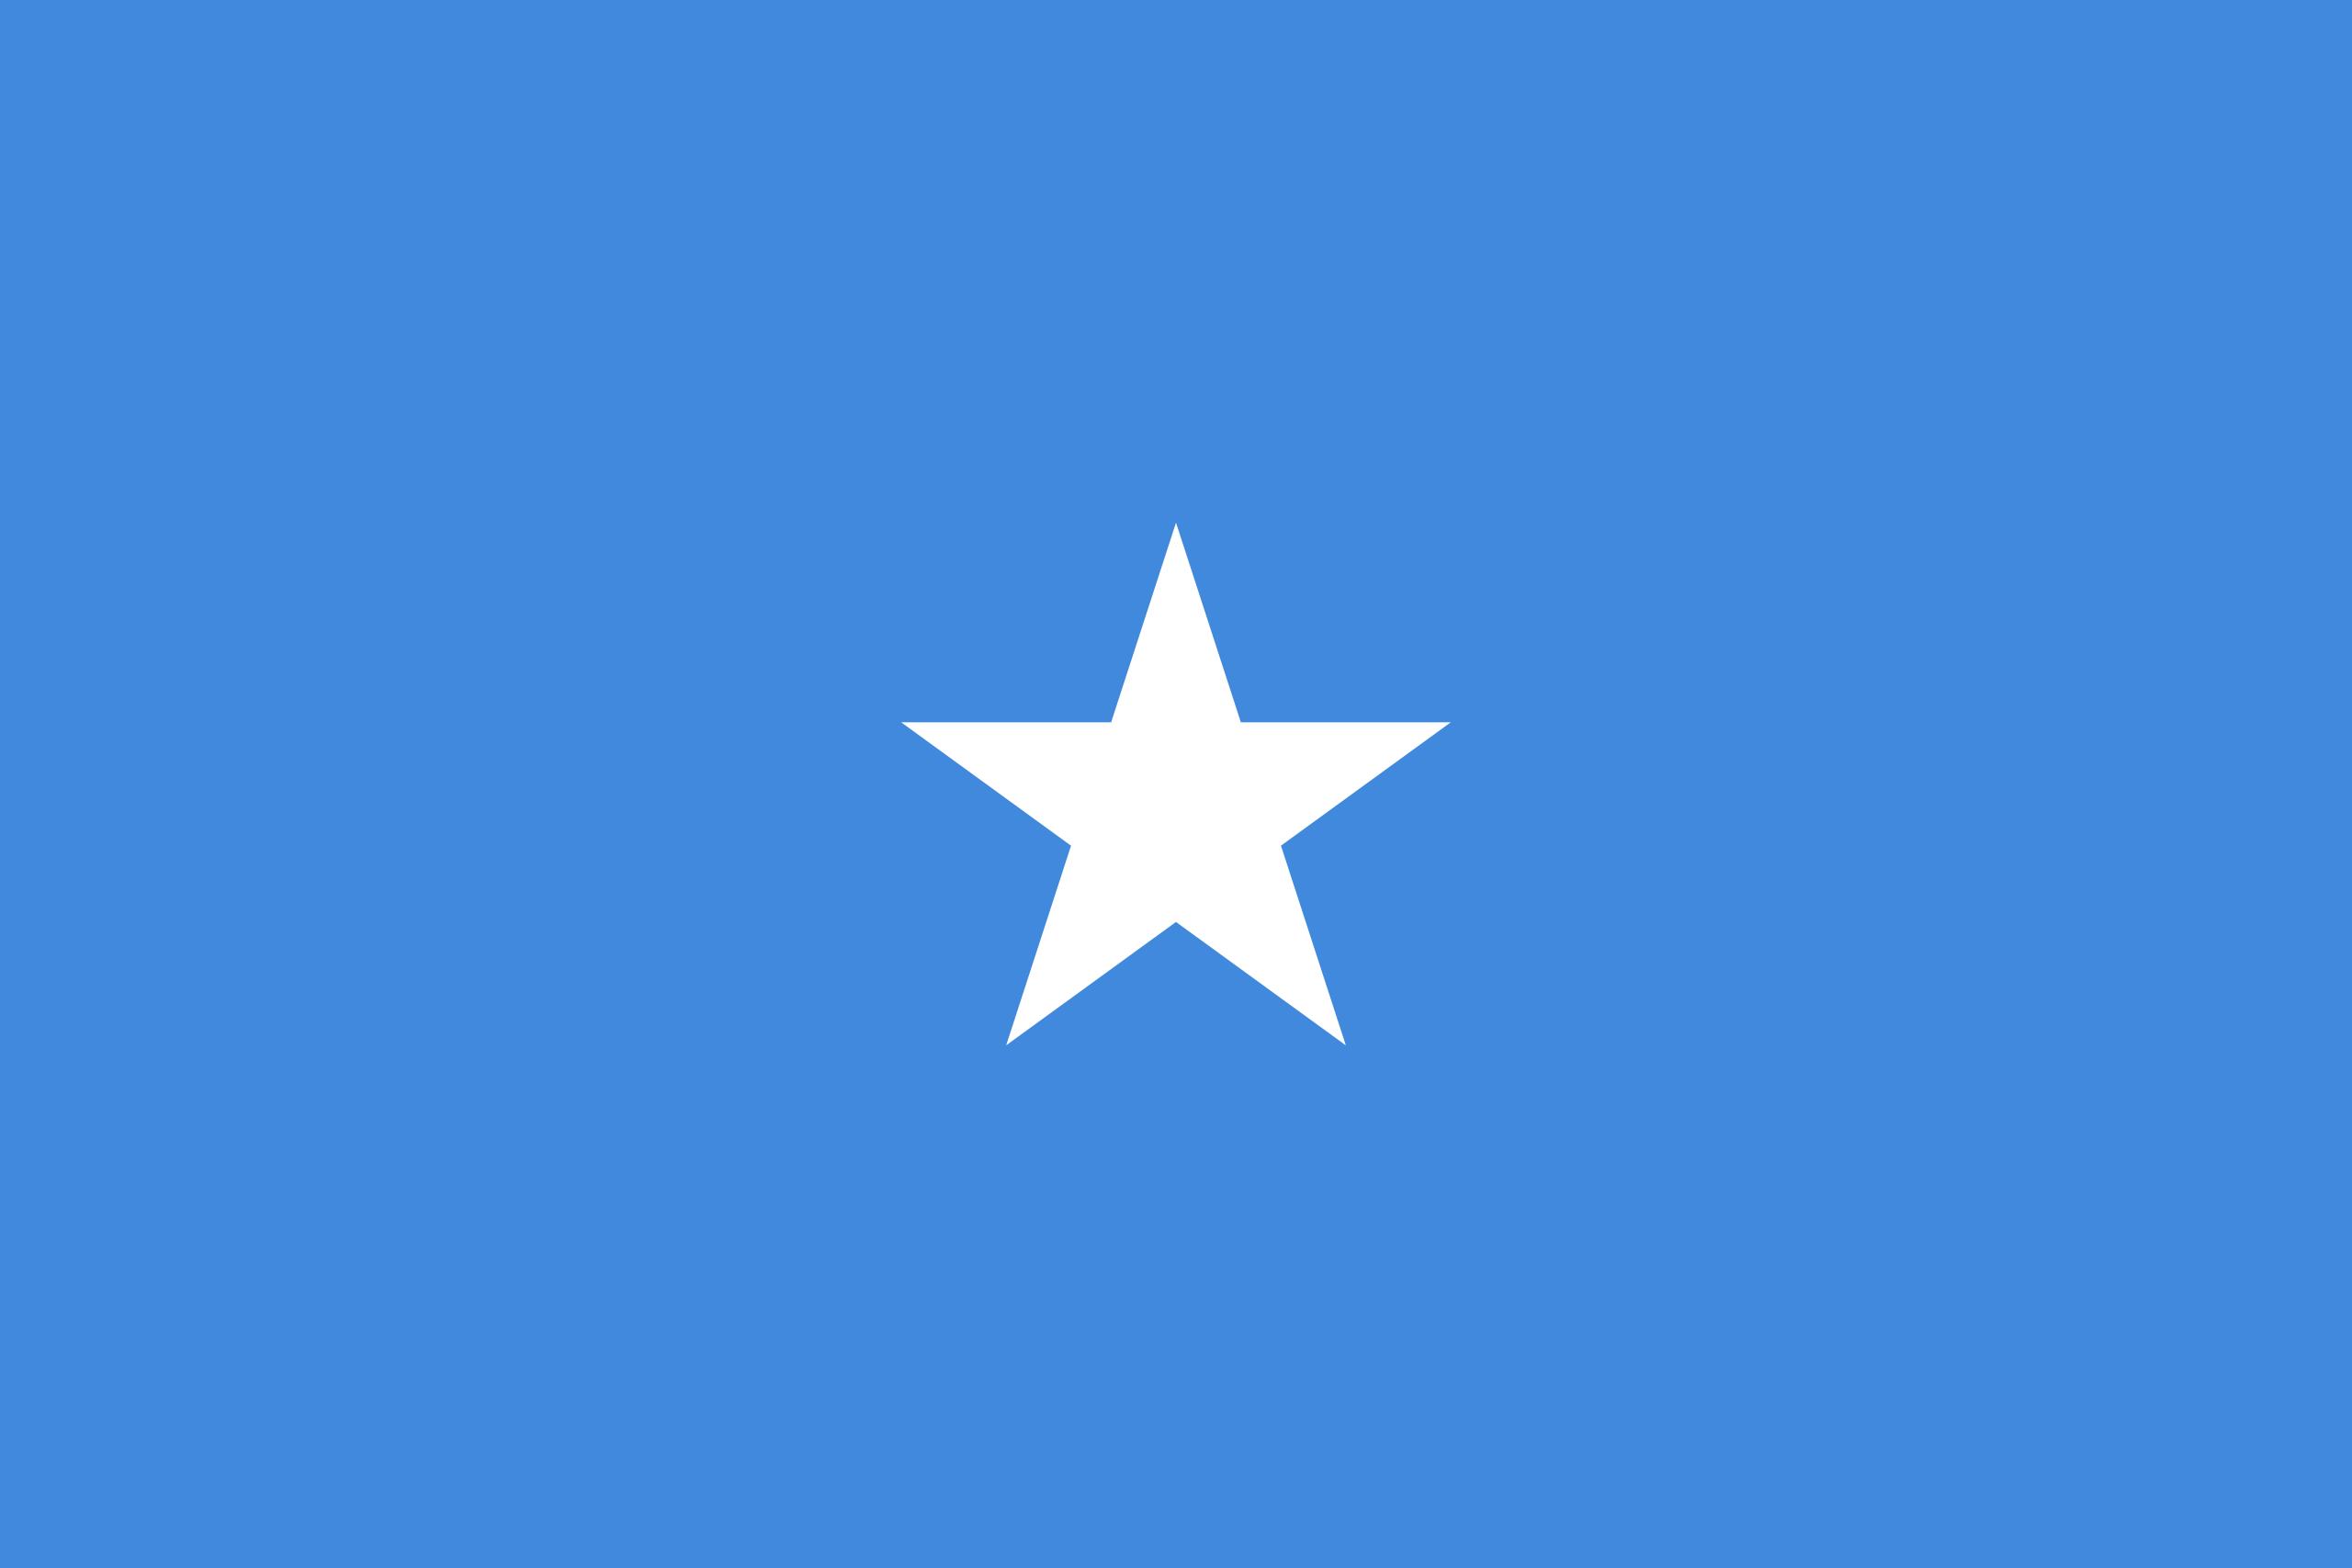 somalia, país, emblema, insignia, シンボル - HD の壁紙 - 教授-falken.com